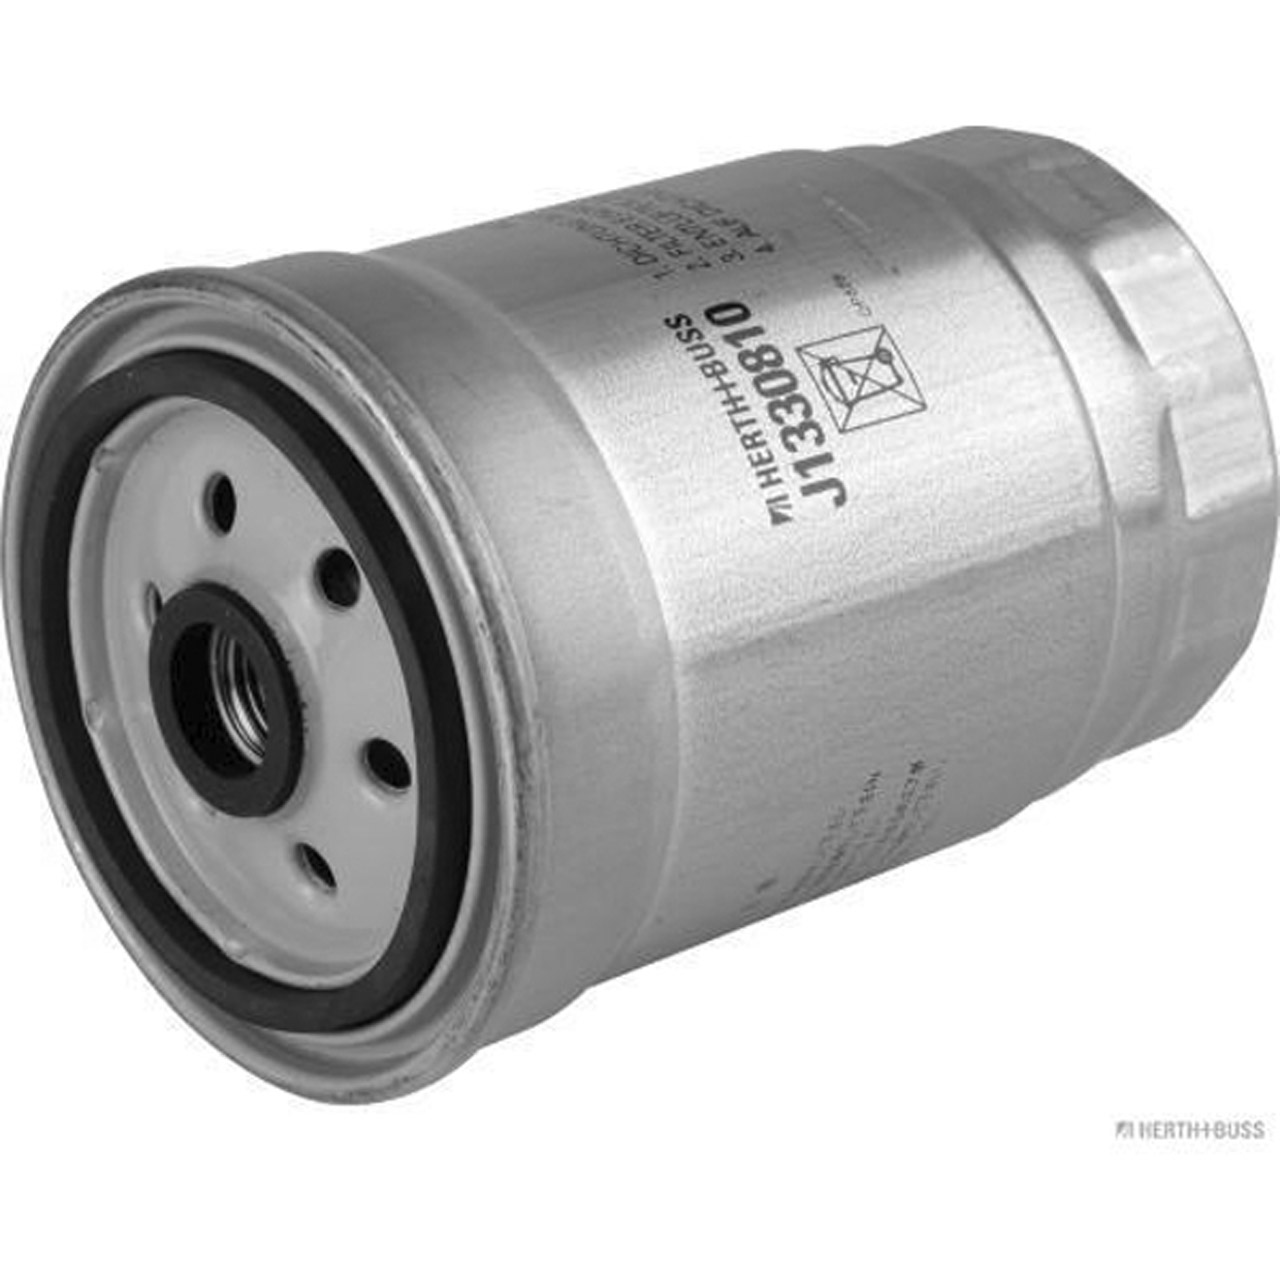 HERTH+BUSS JAKOPARTS Kraftstofffilter Dieselfilter JEEP Cherokee CHRYSLER DODGE 2.8 CRD